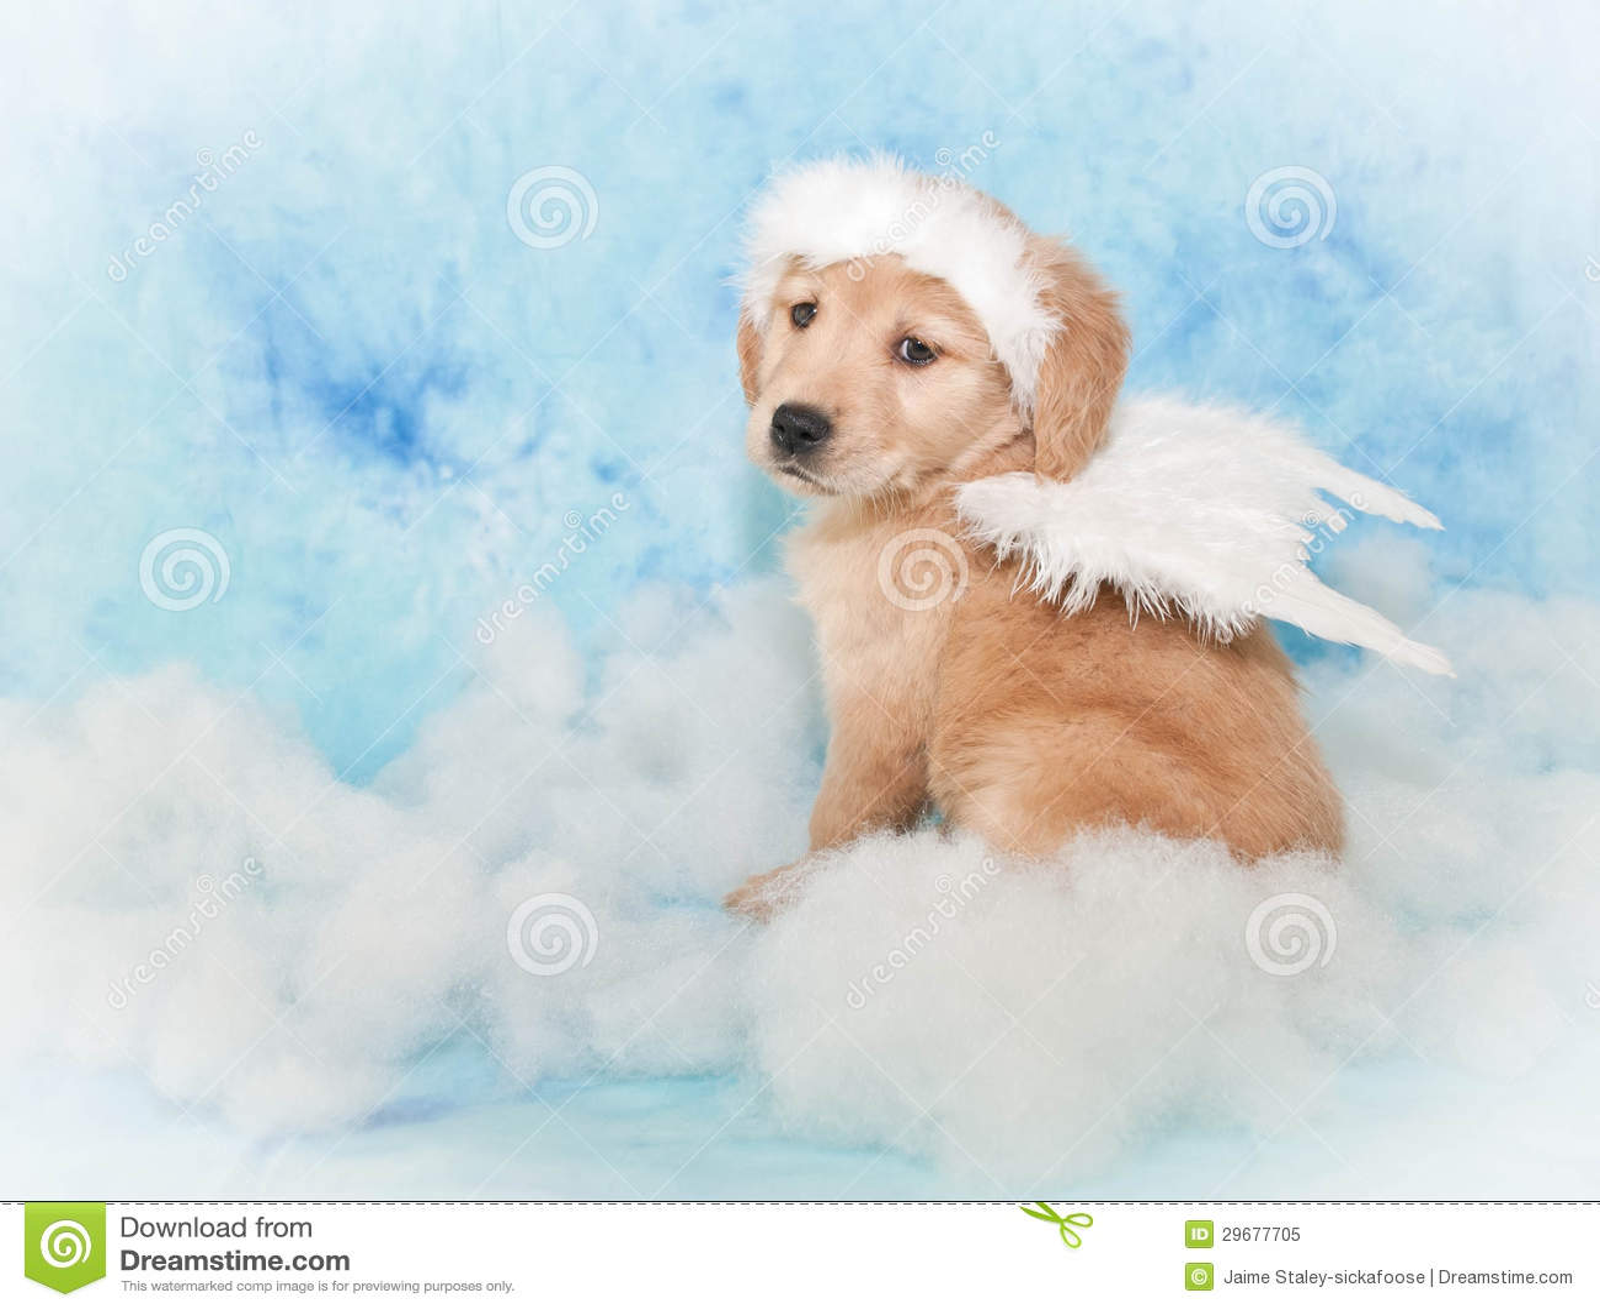 Sweet Angel Puppy Royalty Free Stock Photo Image 29677705